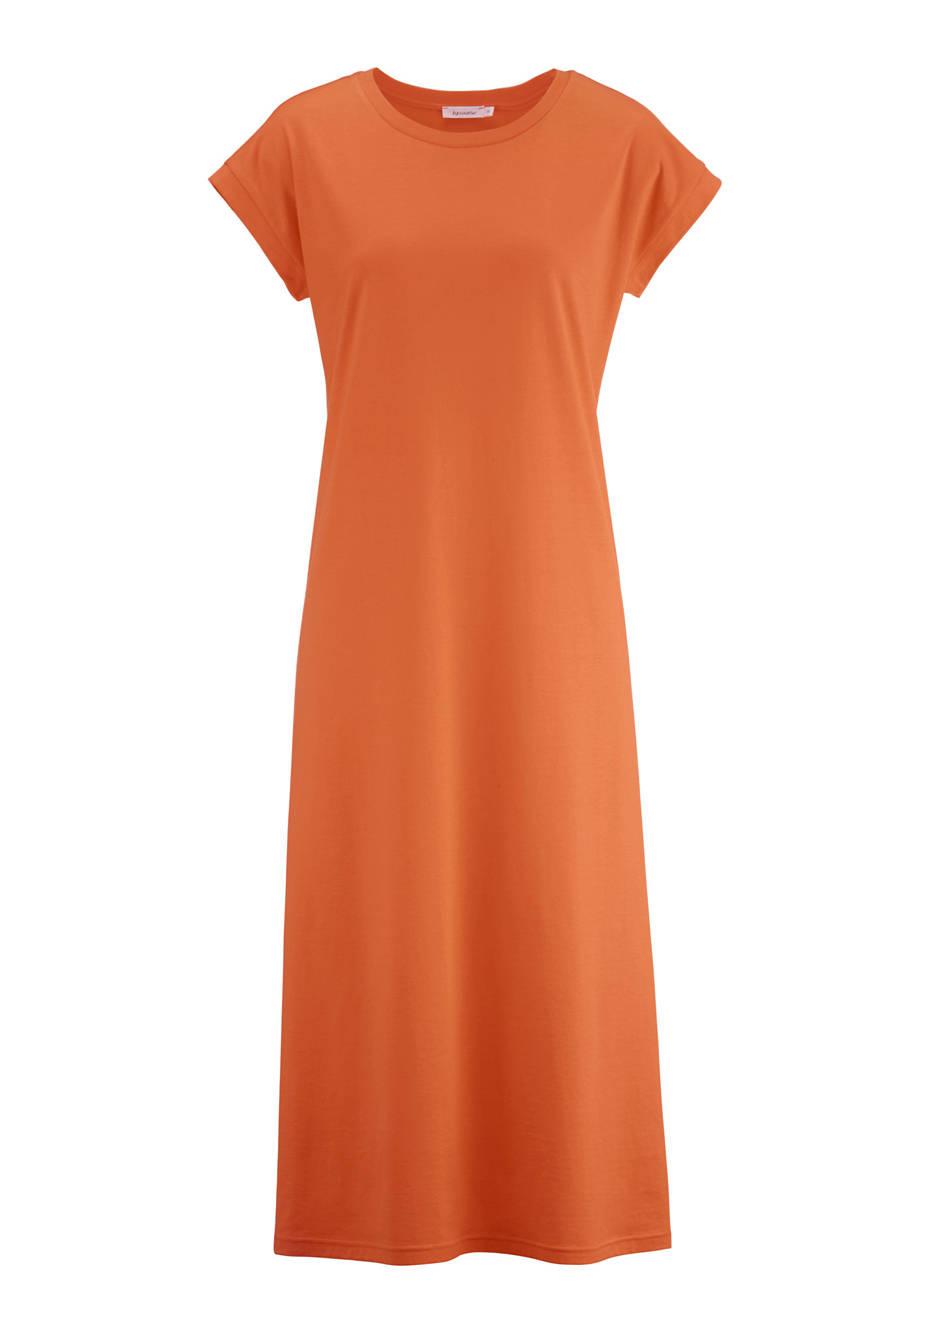 Shirt dress made from pure organic cotton